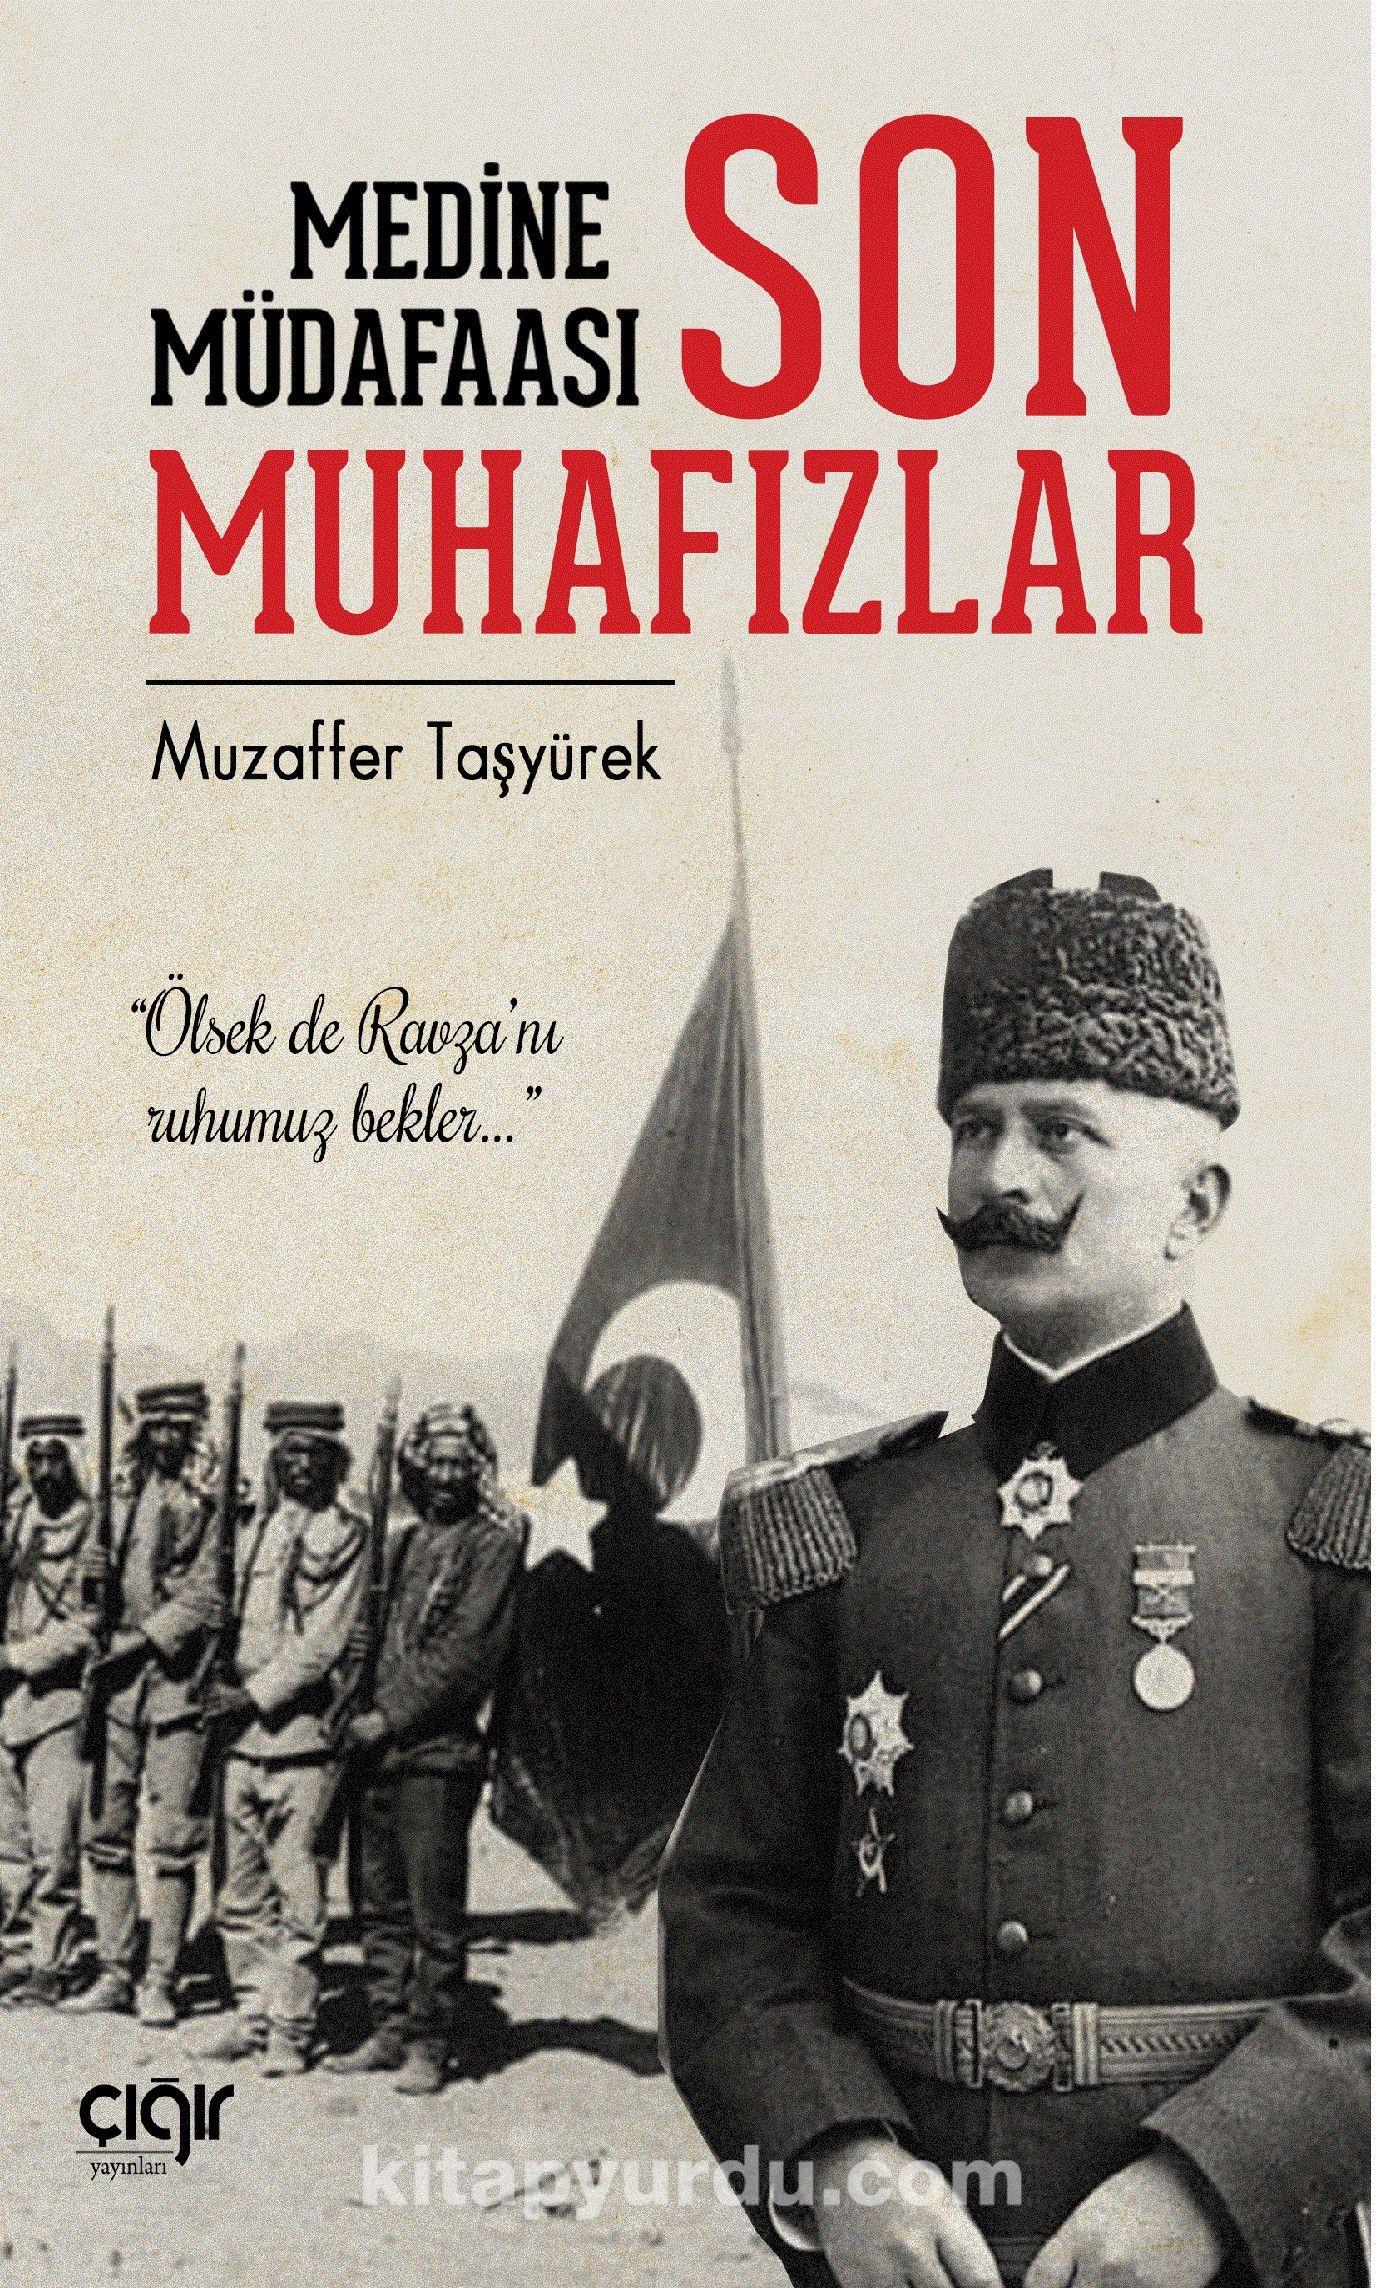 Medine Müdafaası ve Son Muhafızlar - Muzaffer Taşyürek pdf epub